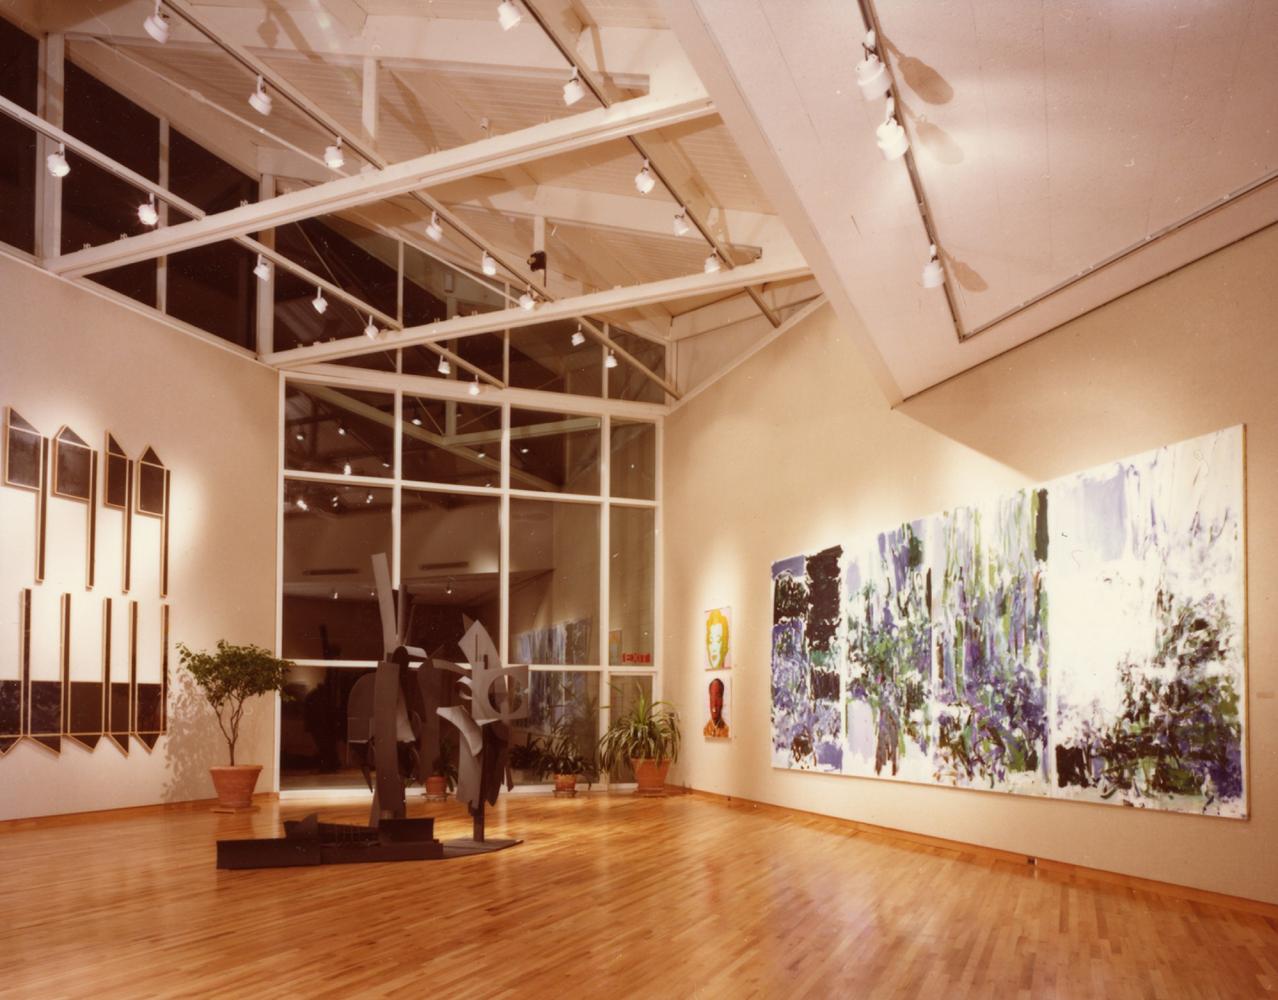 Gallery of AD Classics Miami University Art Museum SOM 6